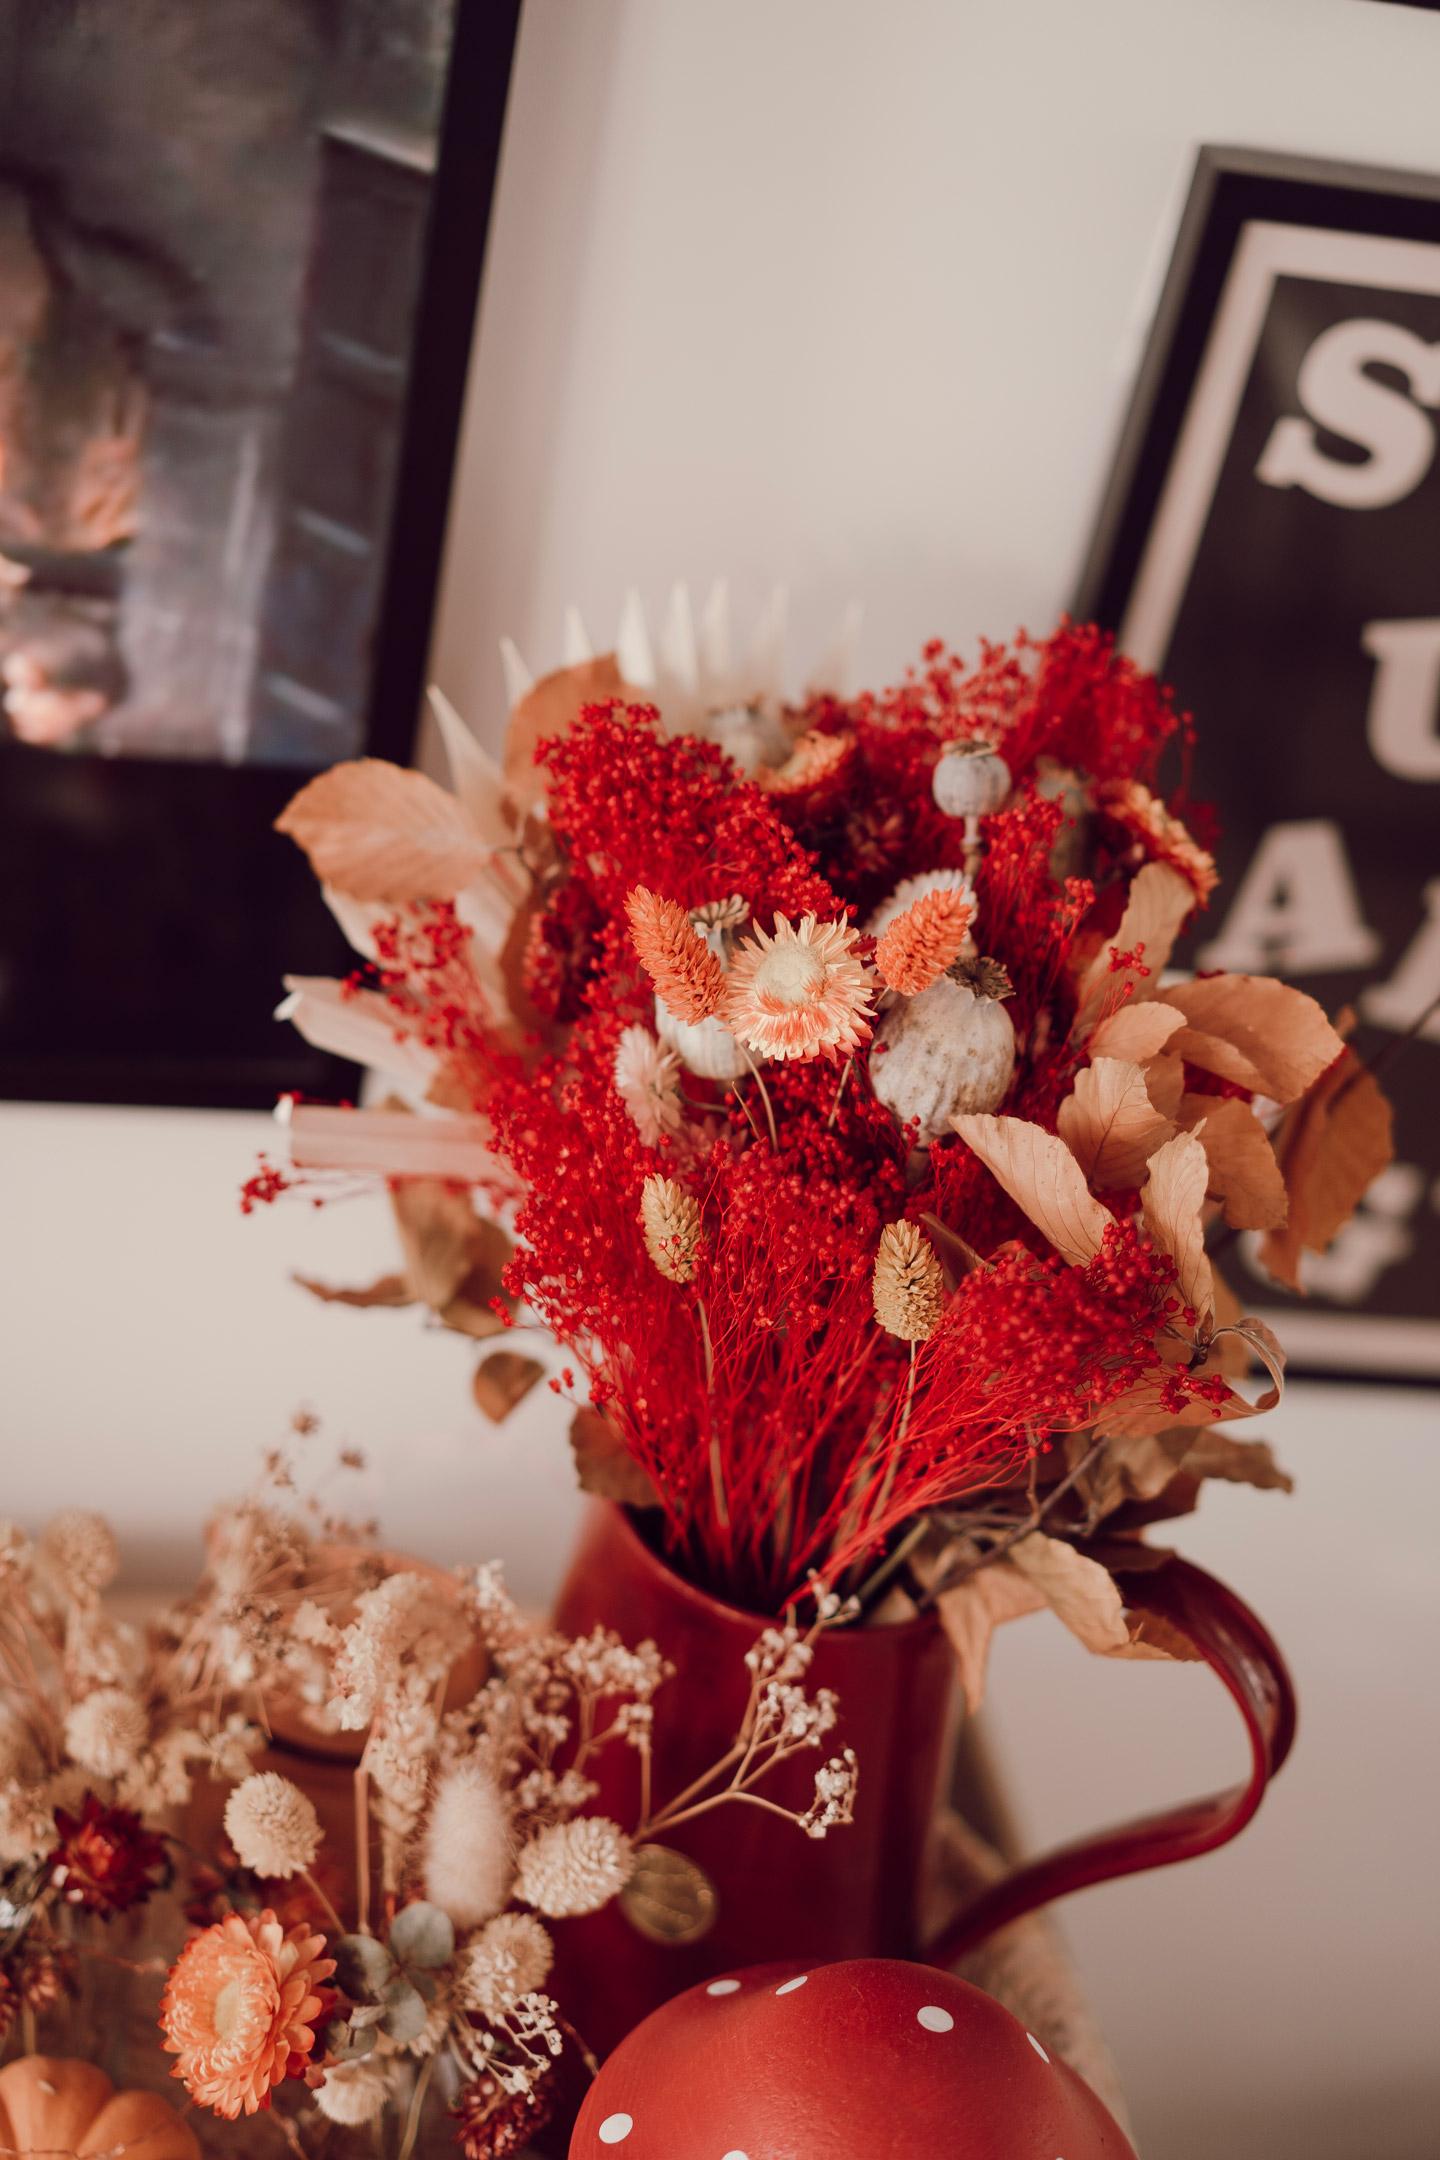 decoration-automne-03709